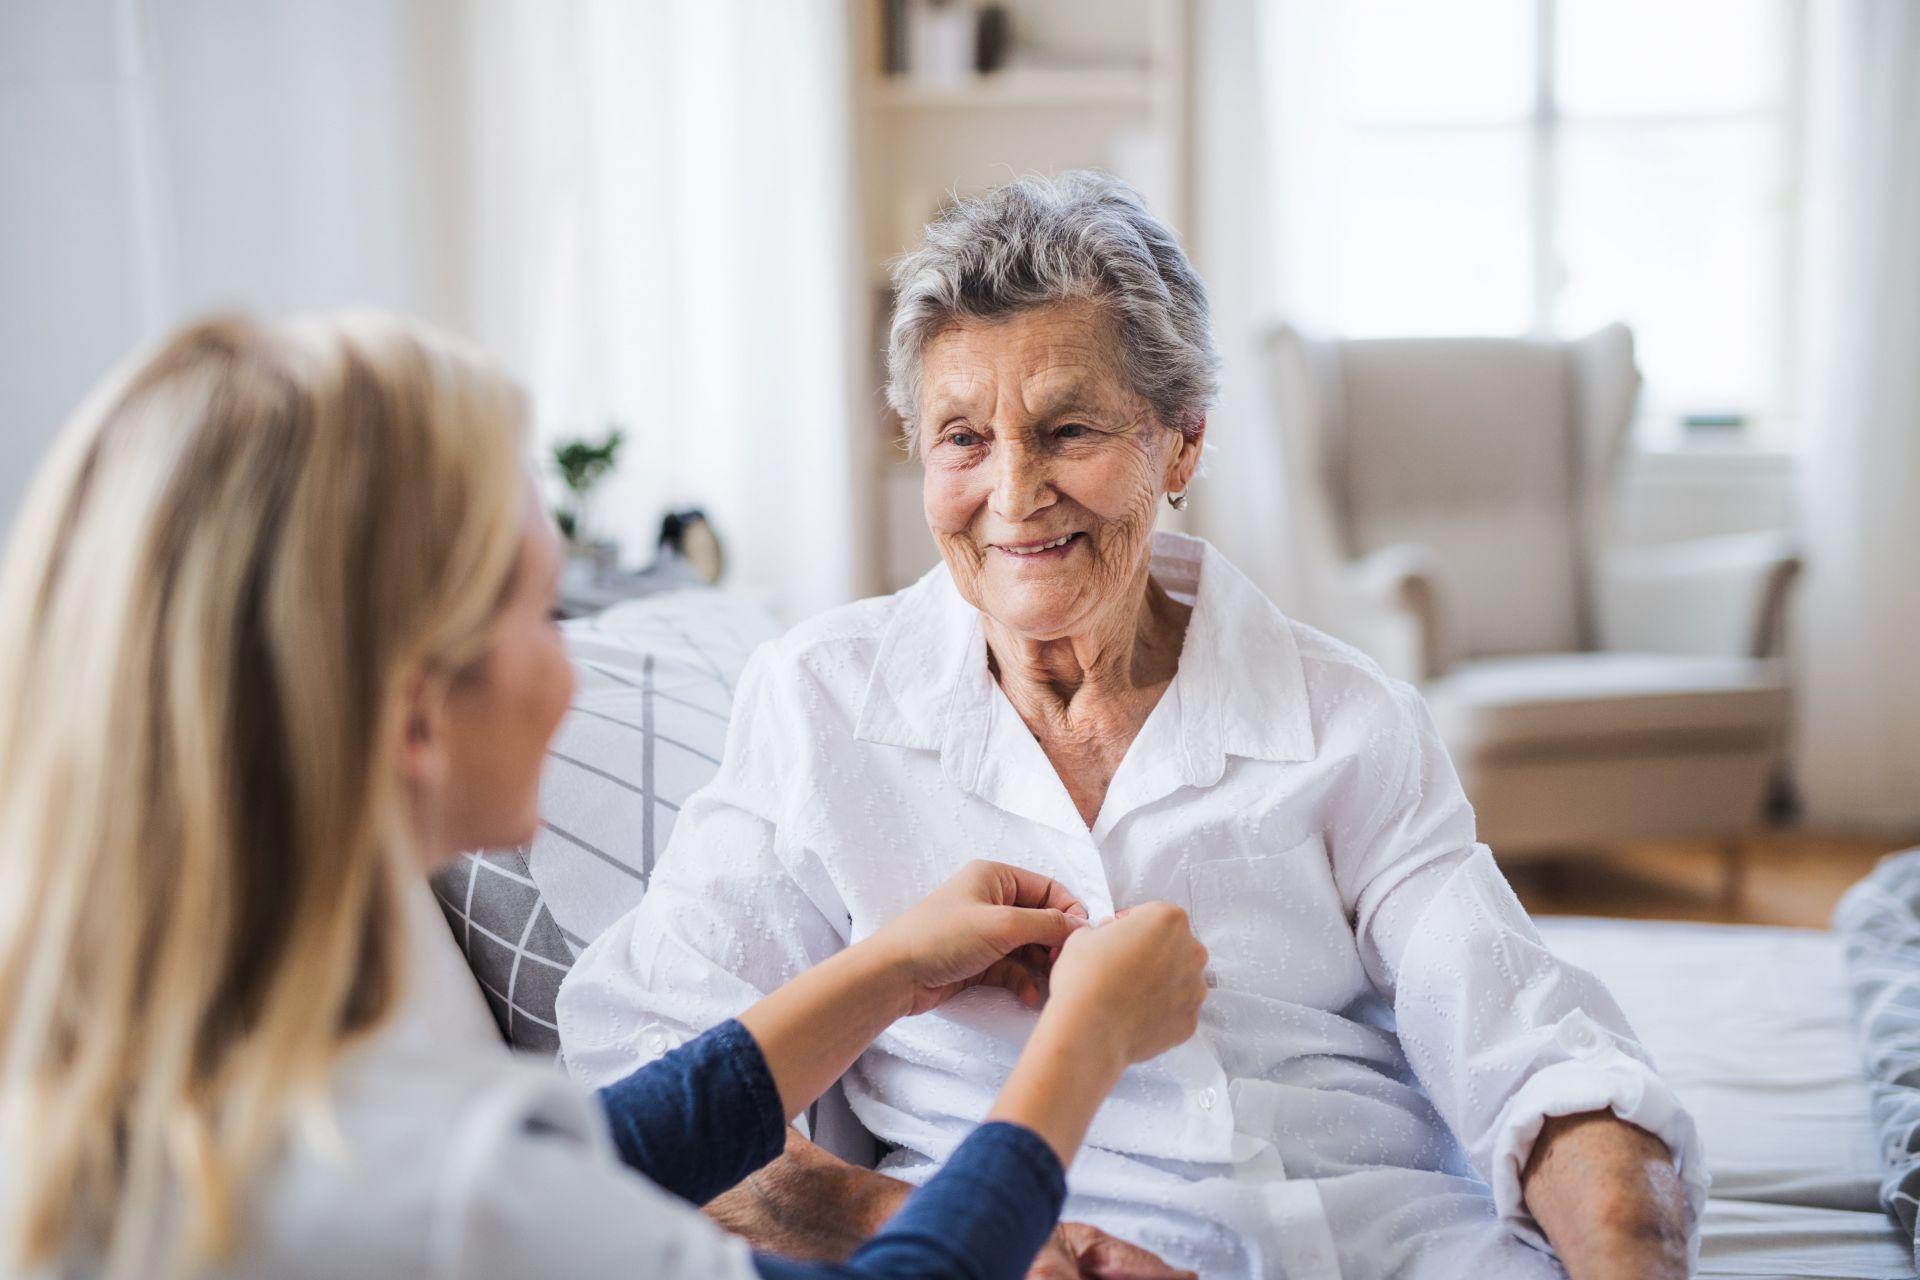 adobestock 244536746 min - SHD Seniorenhilfe: 24-Stunden-Betreuung mit regionalem Charakter